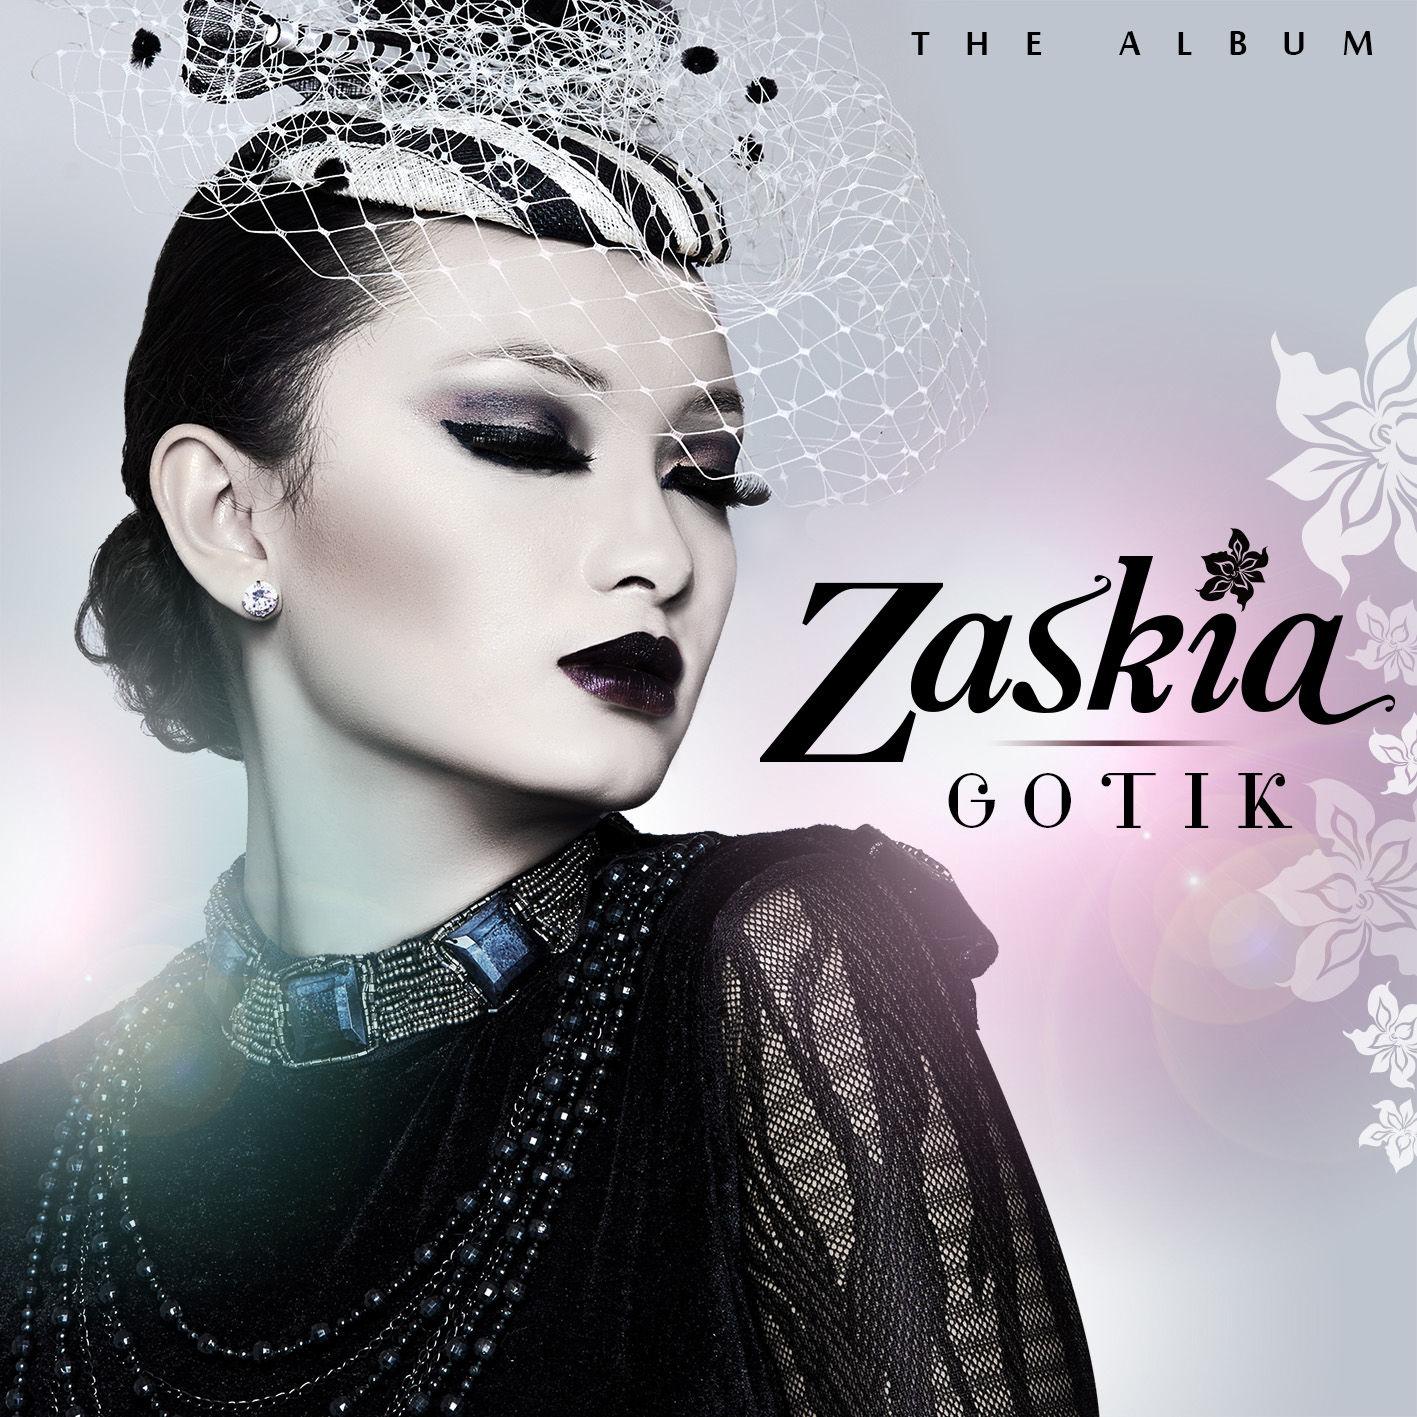 Zaskia Gotik Songs | ReverbNation